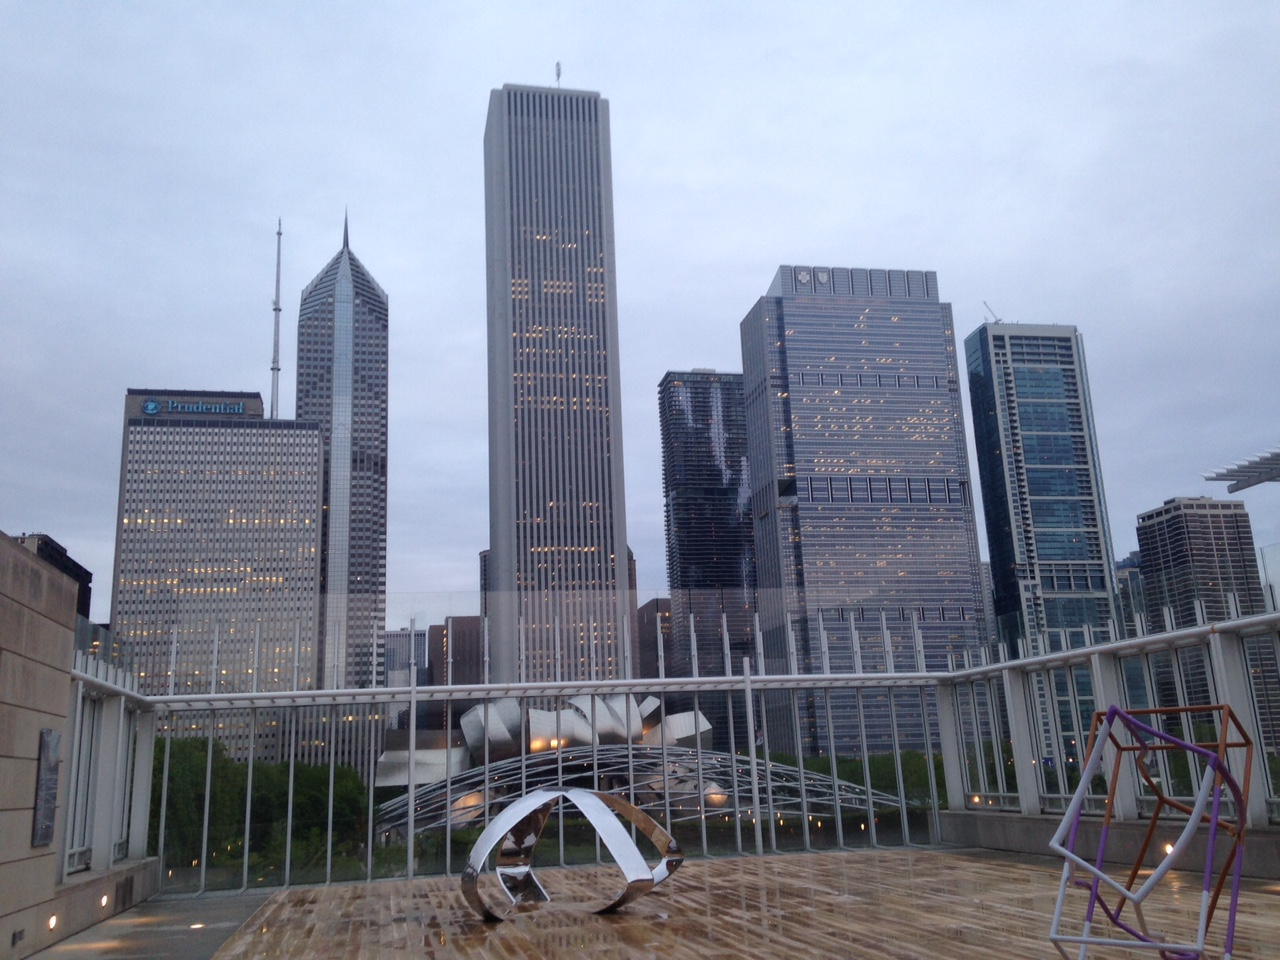 Chicago Skyline from Art Institute